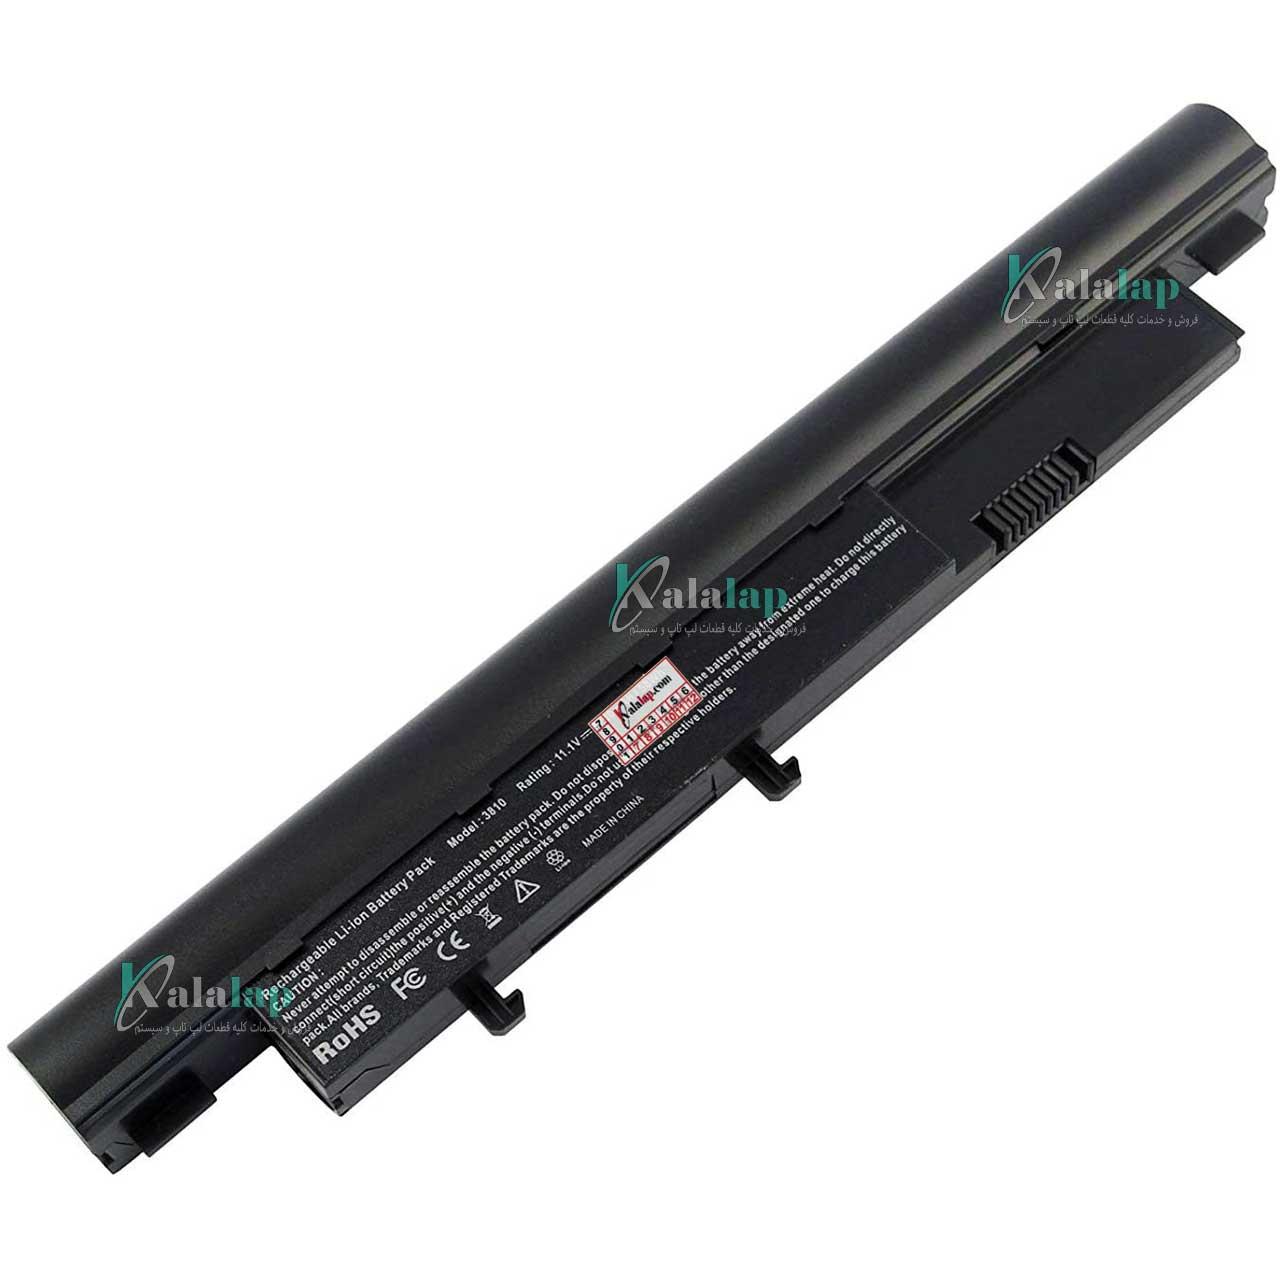 باتری لپتاپ ایسر Aspire 3810 4810 5810 AS09D78